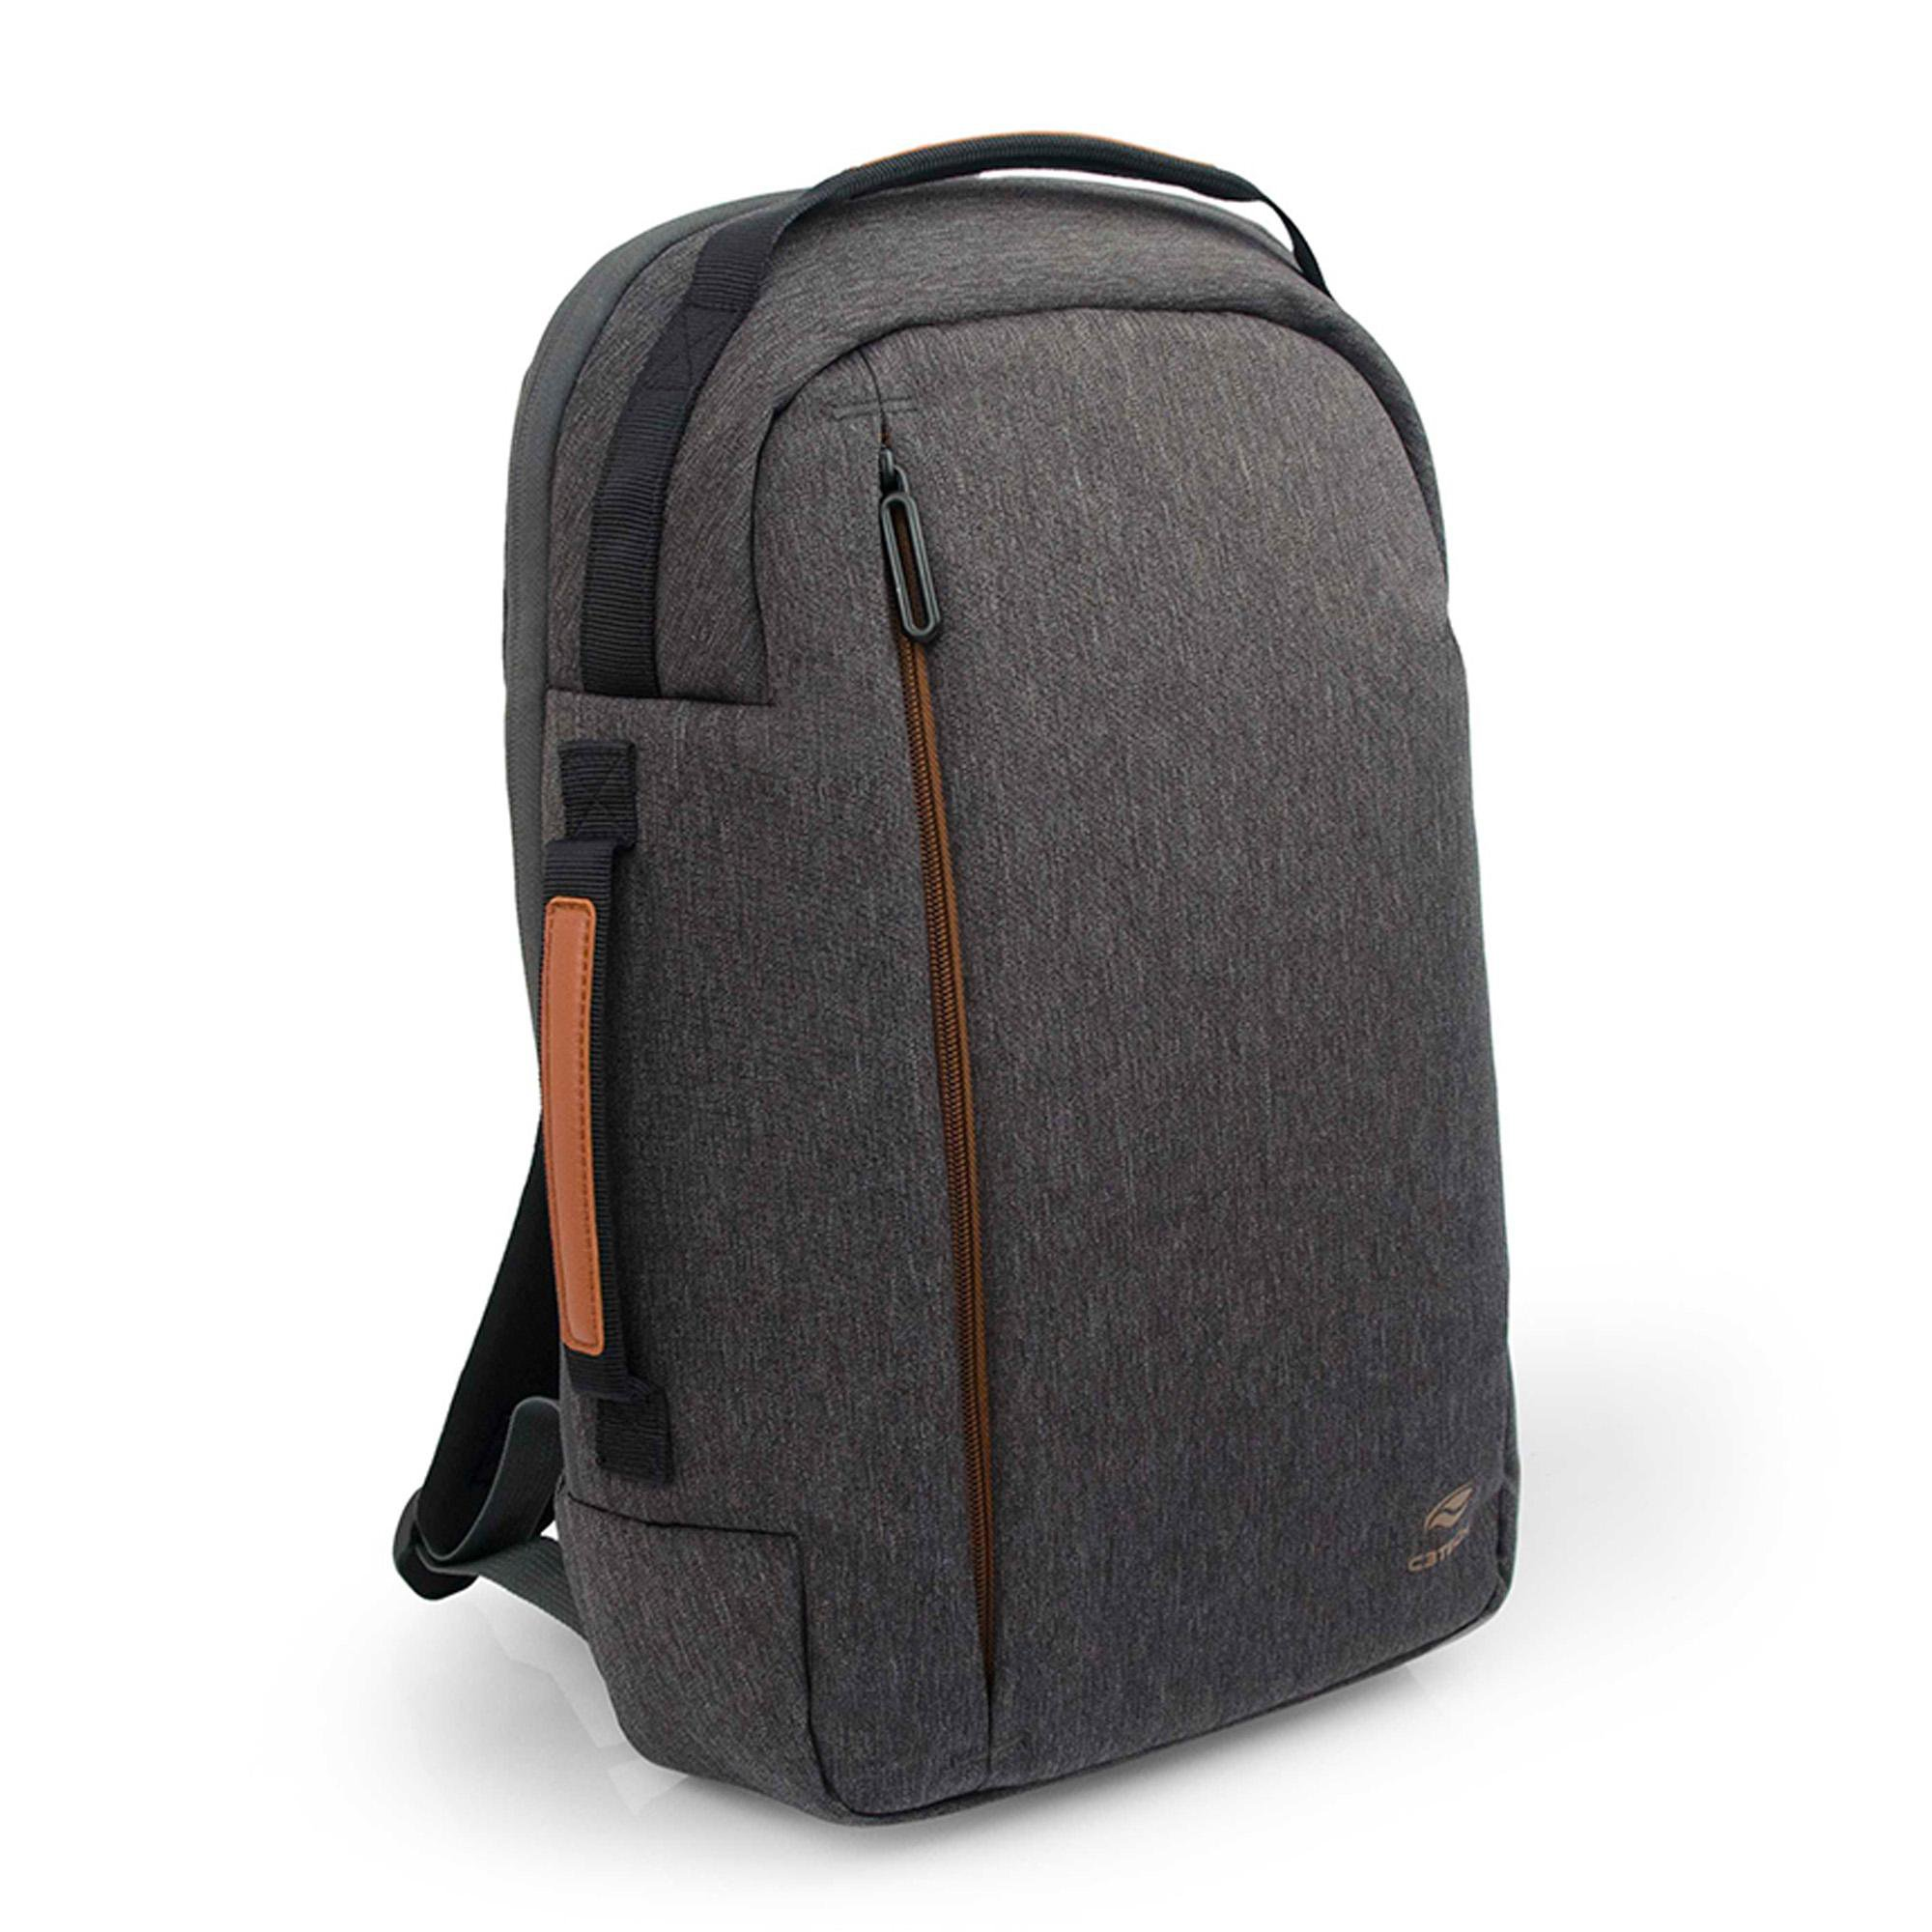 mochila para notebook incrivel c3tech mc 30gy cinza 156 london 50290 2000 201595 1